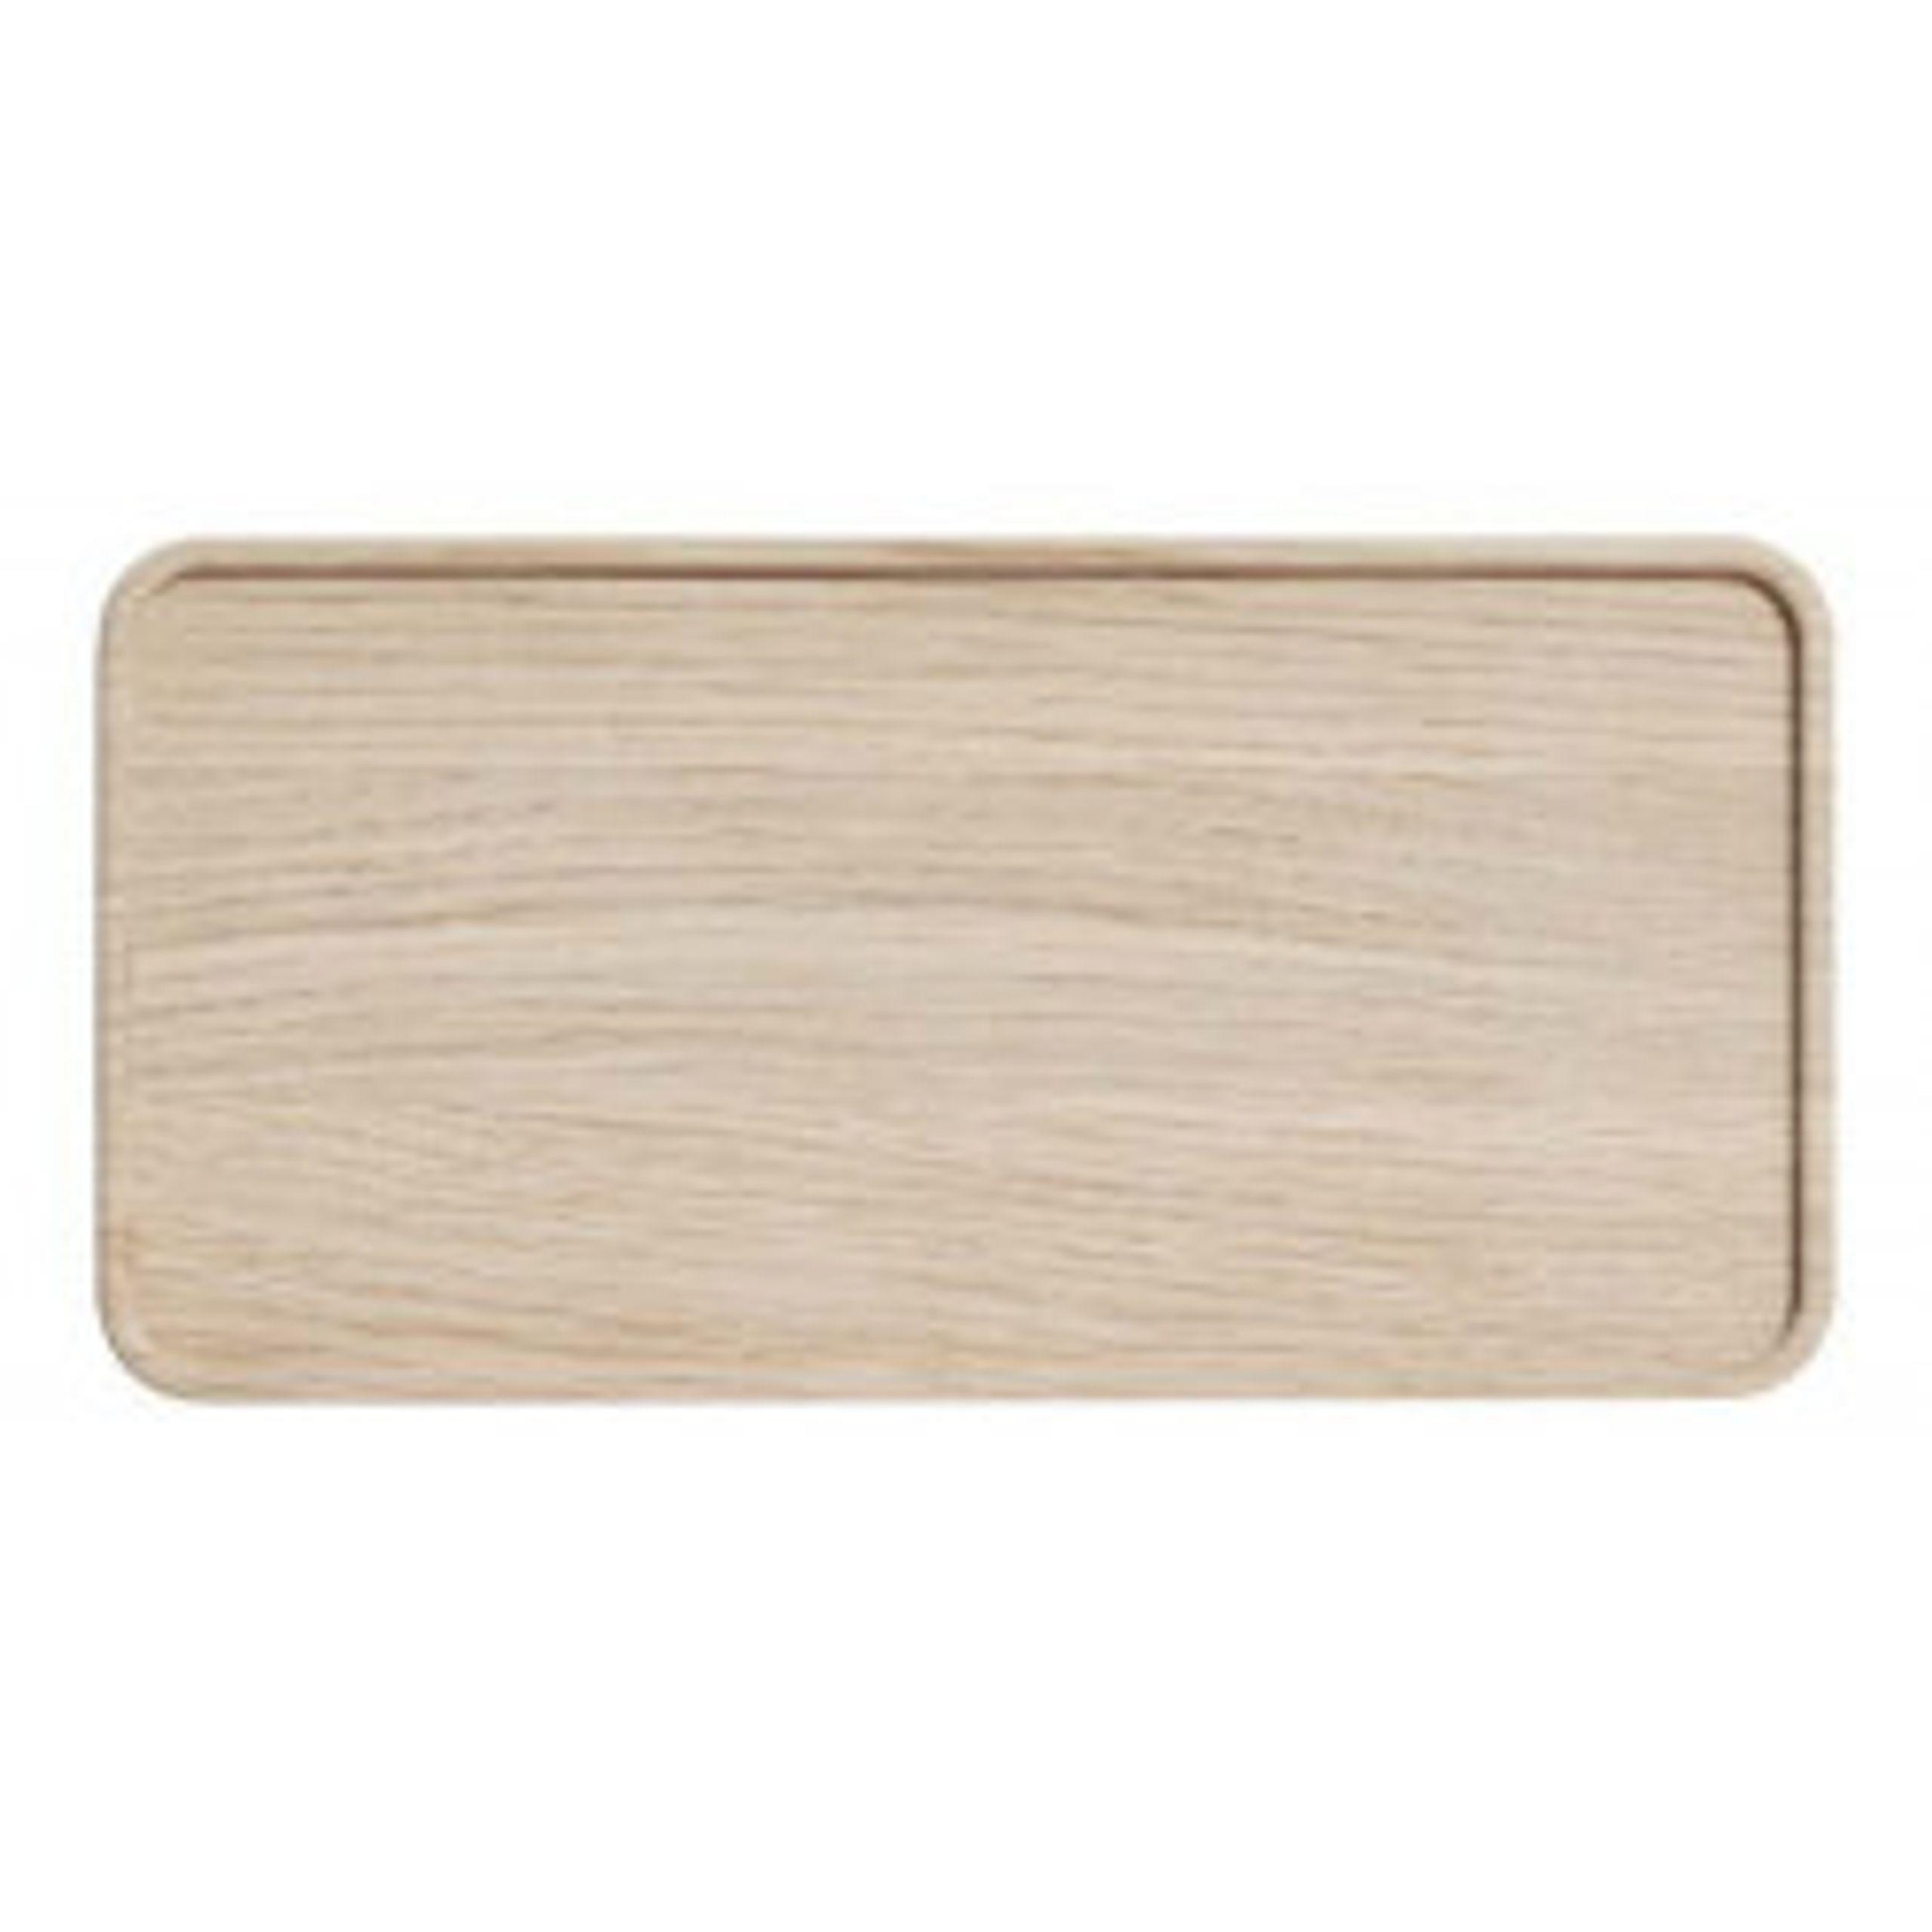 Andersen Furniture   Office   Create Me   Tray Small Oak ...